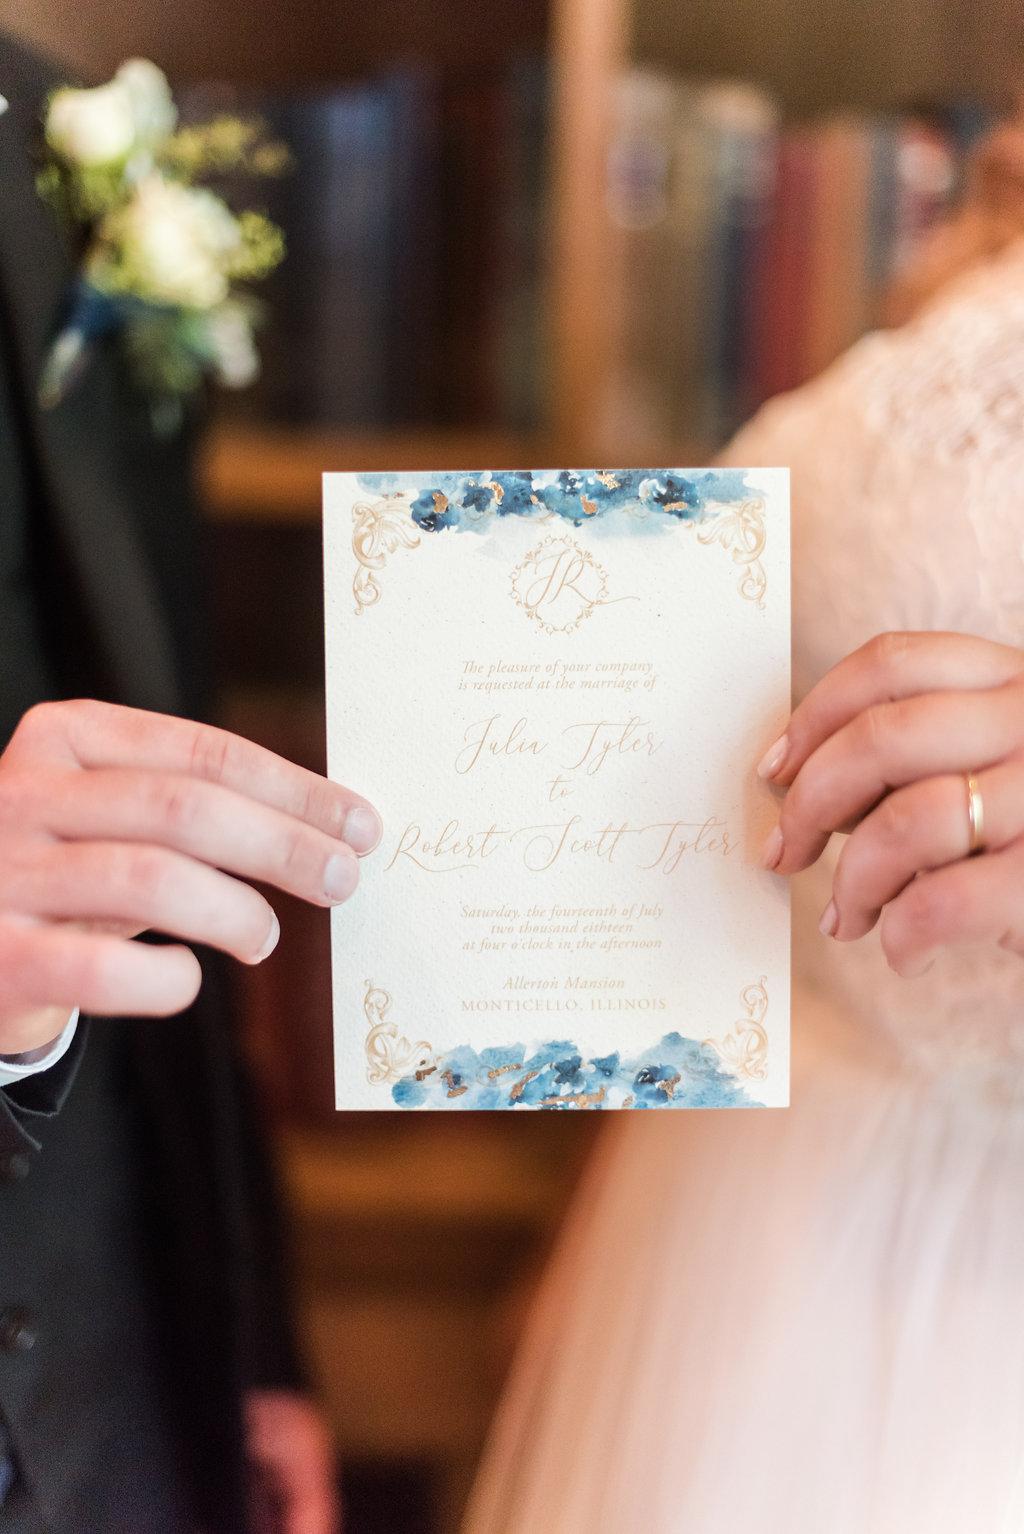 Navy and Gold Wedding Gown Chicago Wedding Rakoteet Photography